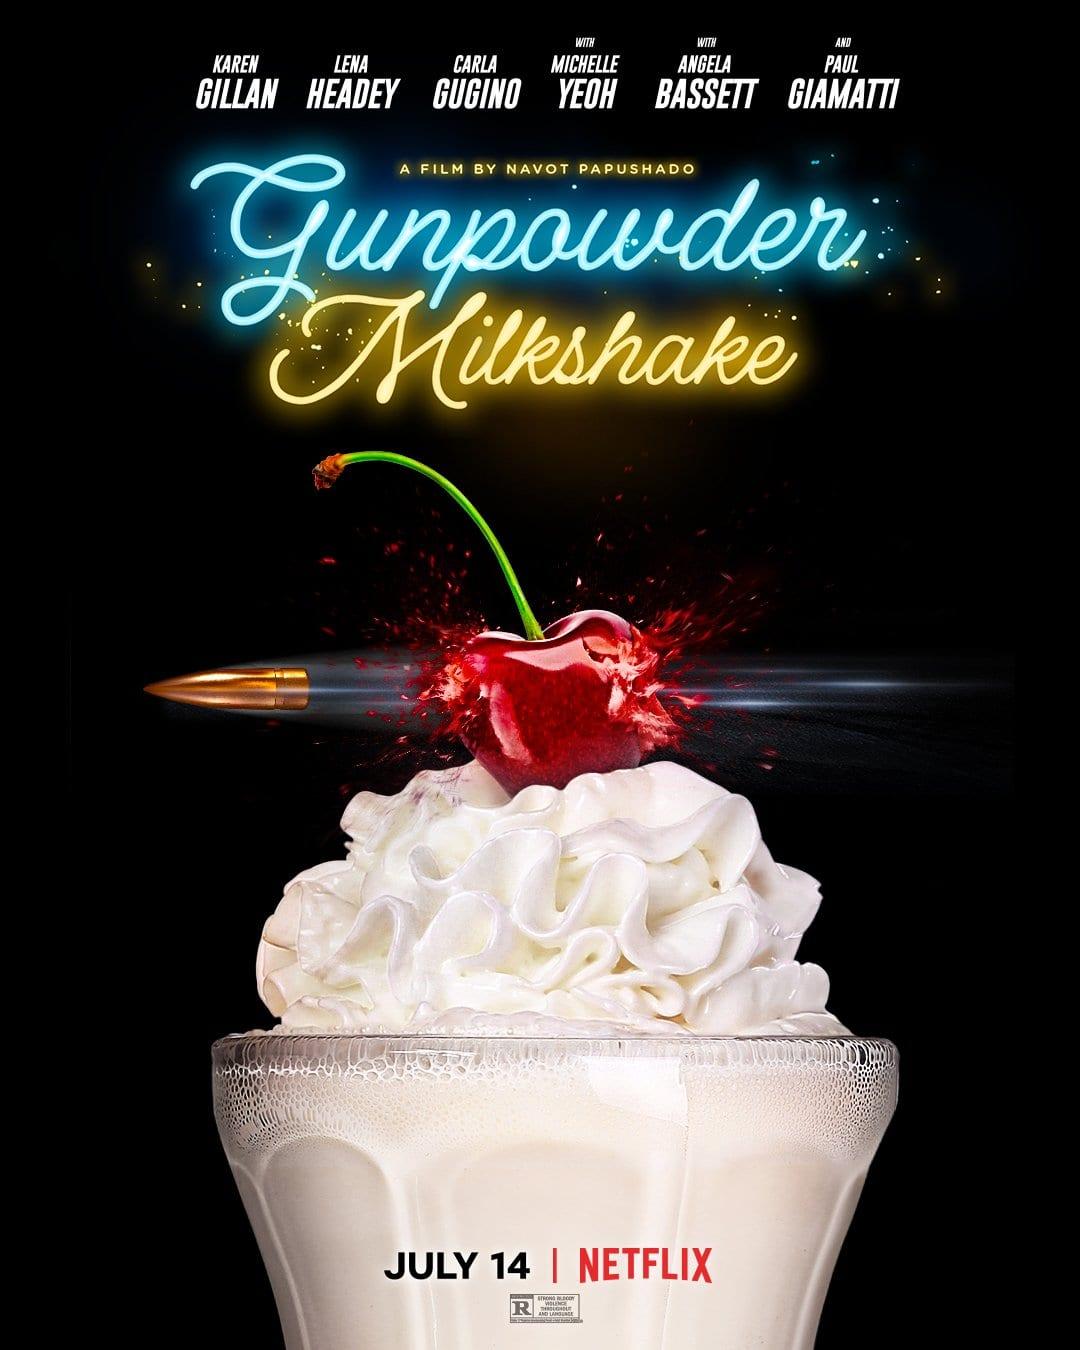 gunpowder milkshake poster netflix